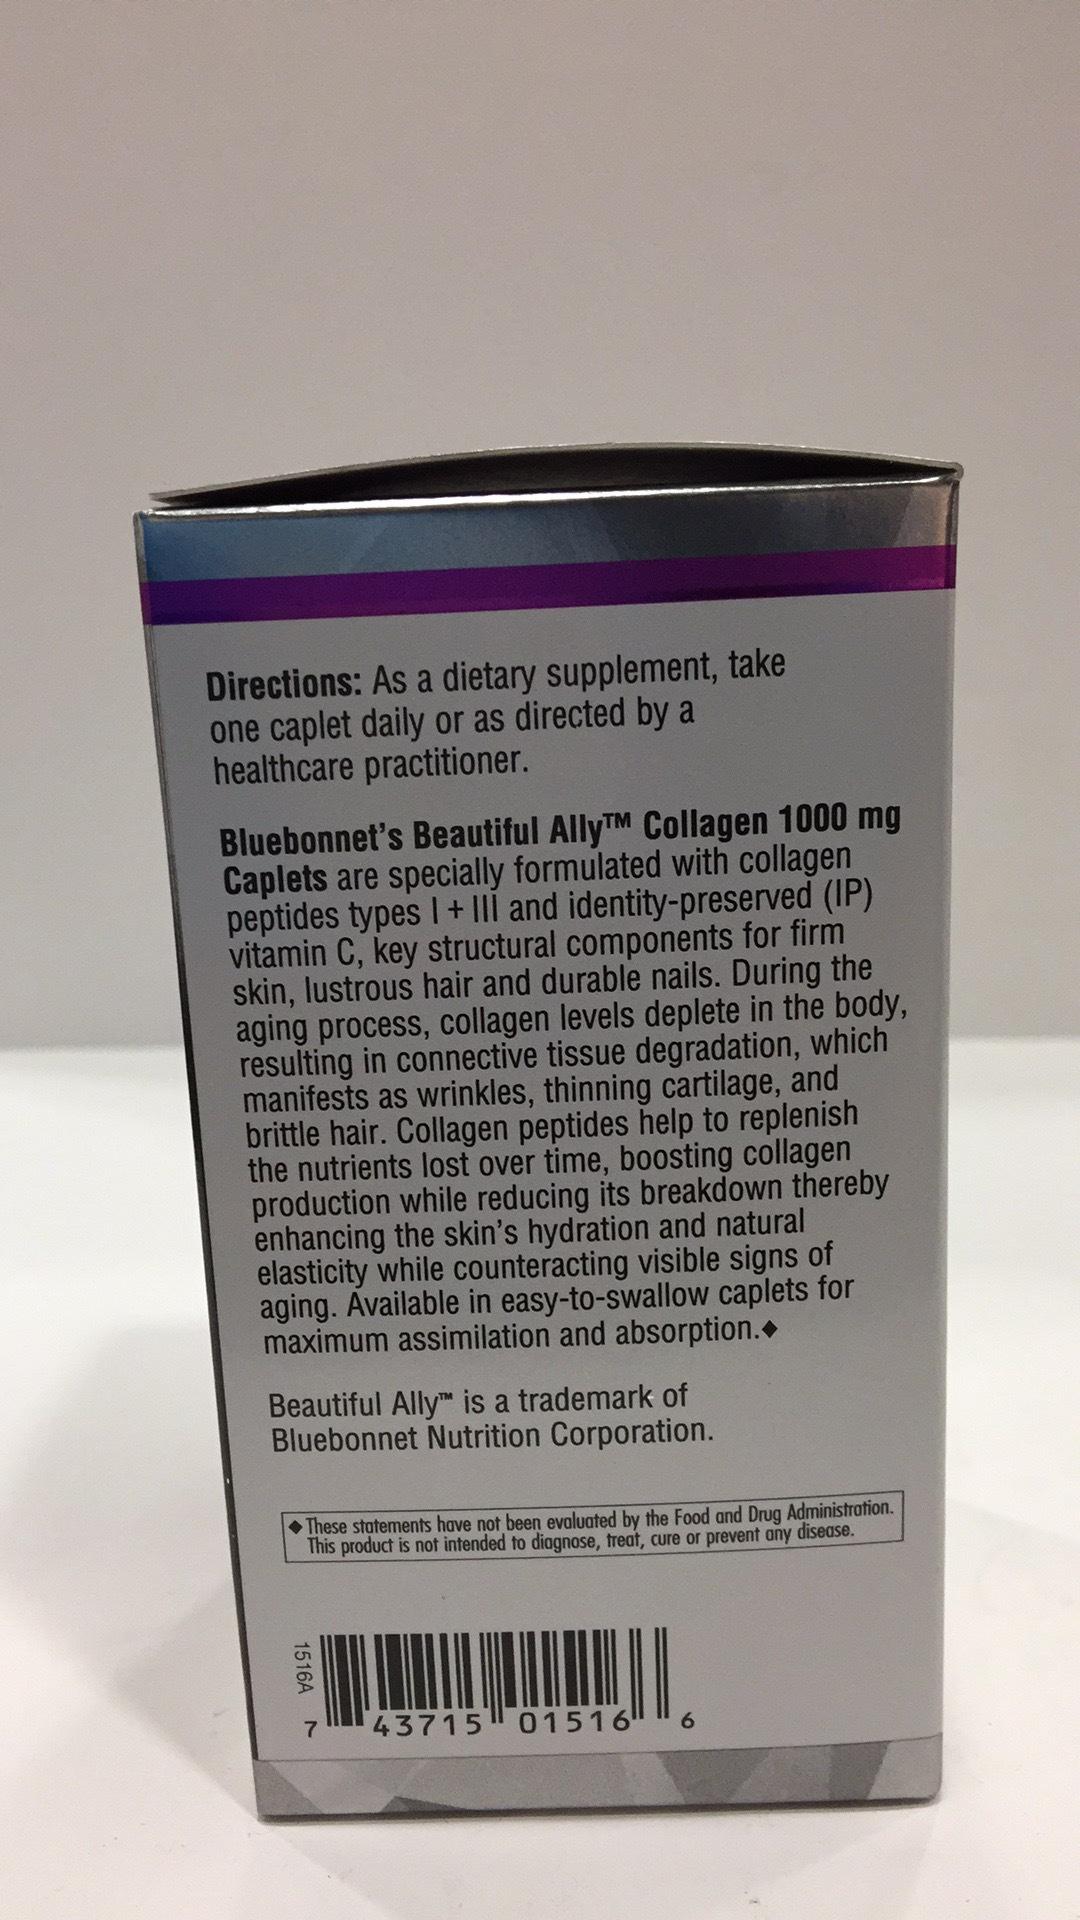 ... Collagen 1000 Mg Dietary Supplement ...